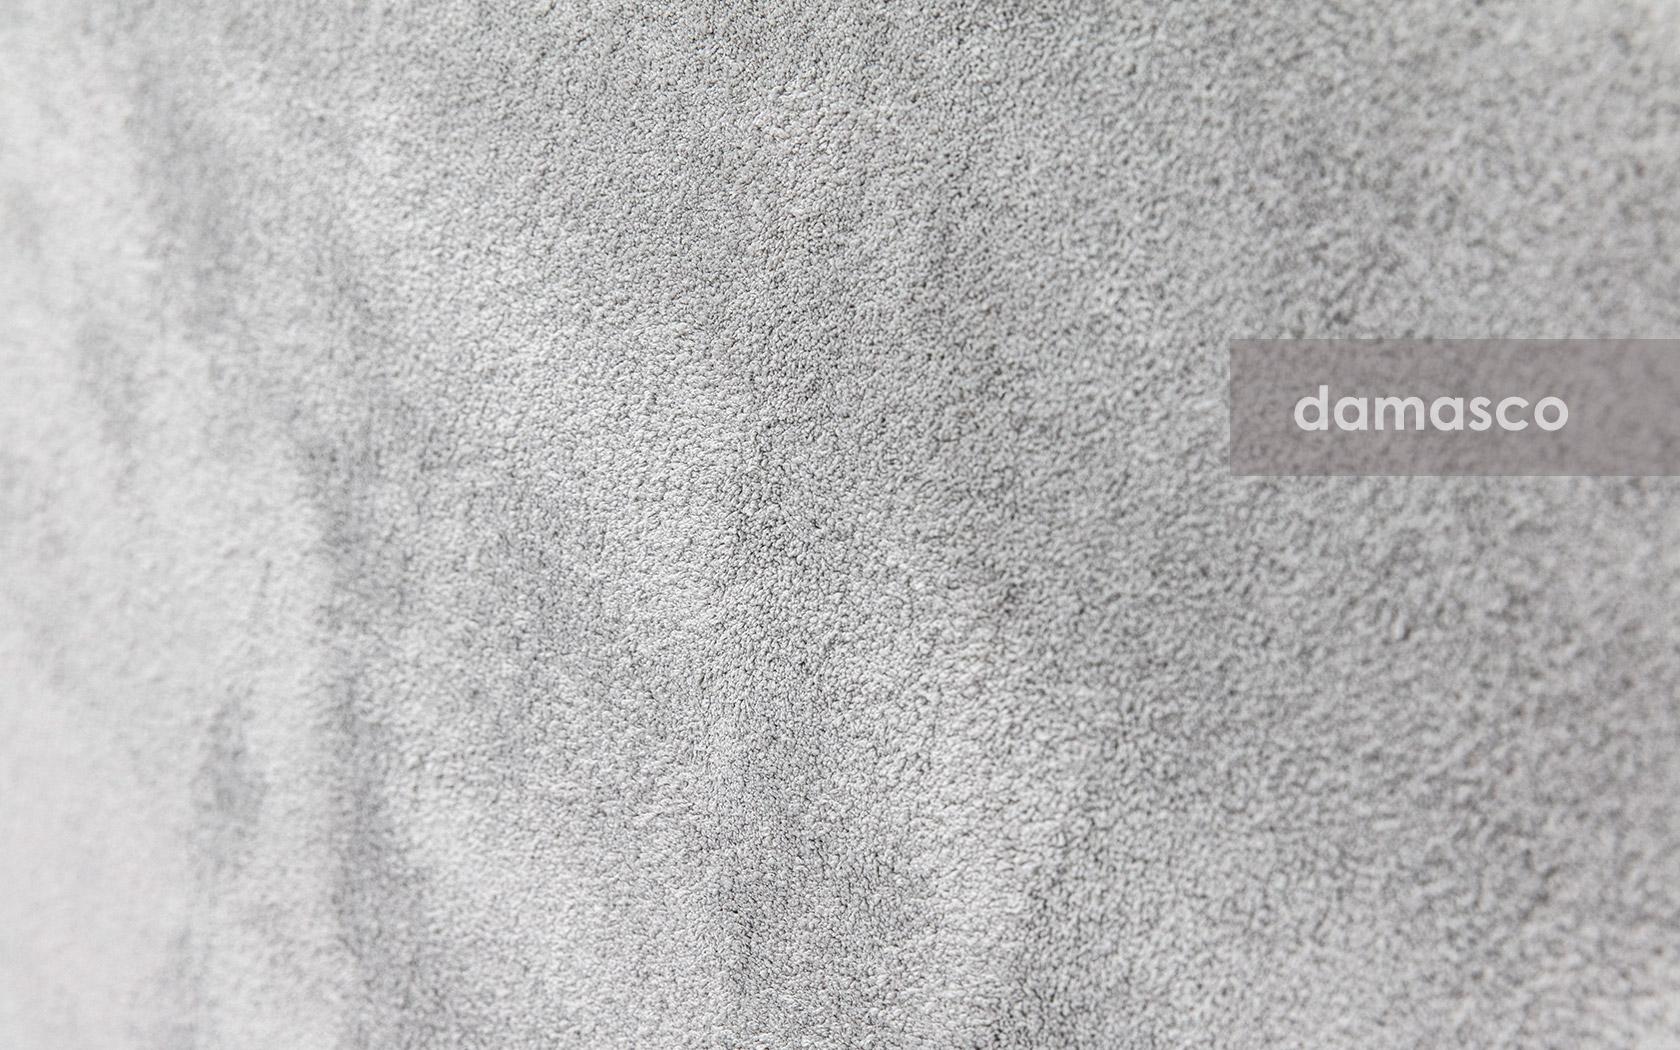 damasco-alfombra-2021-baja-02